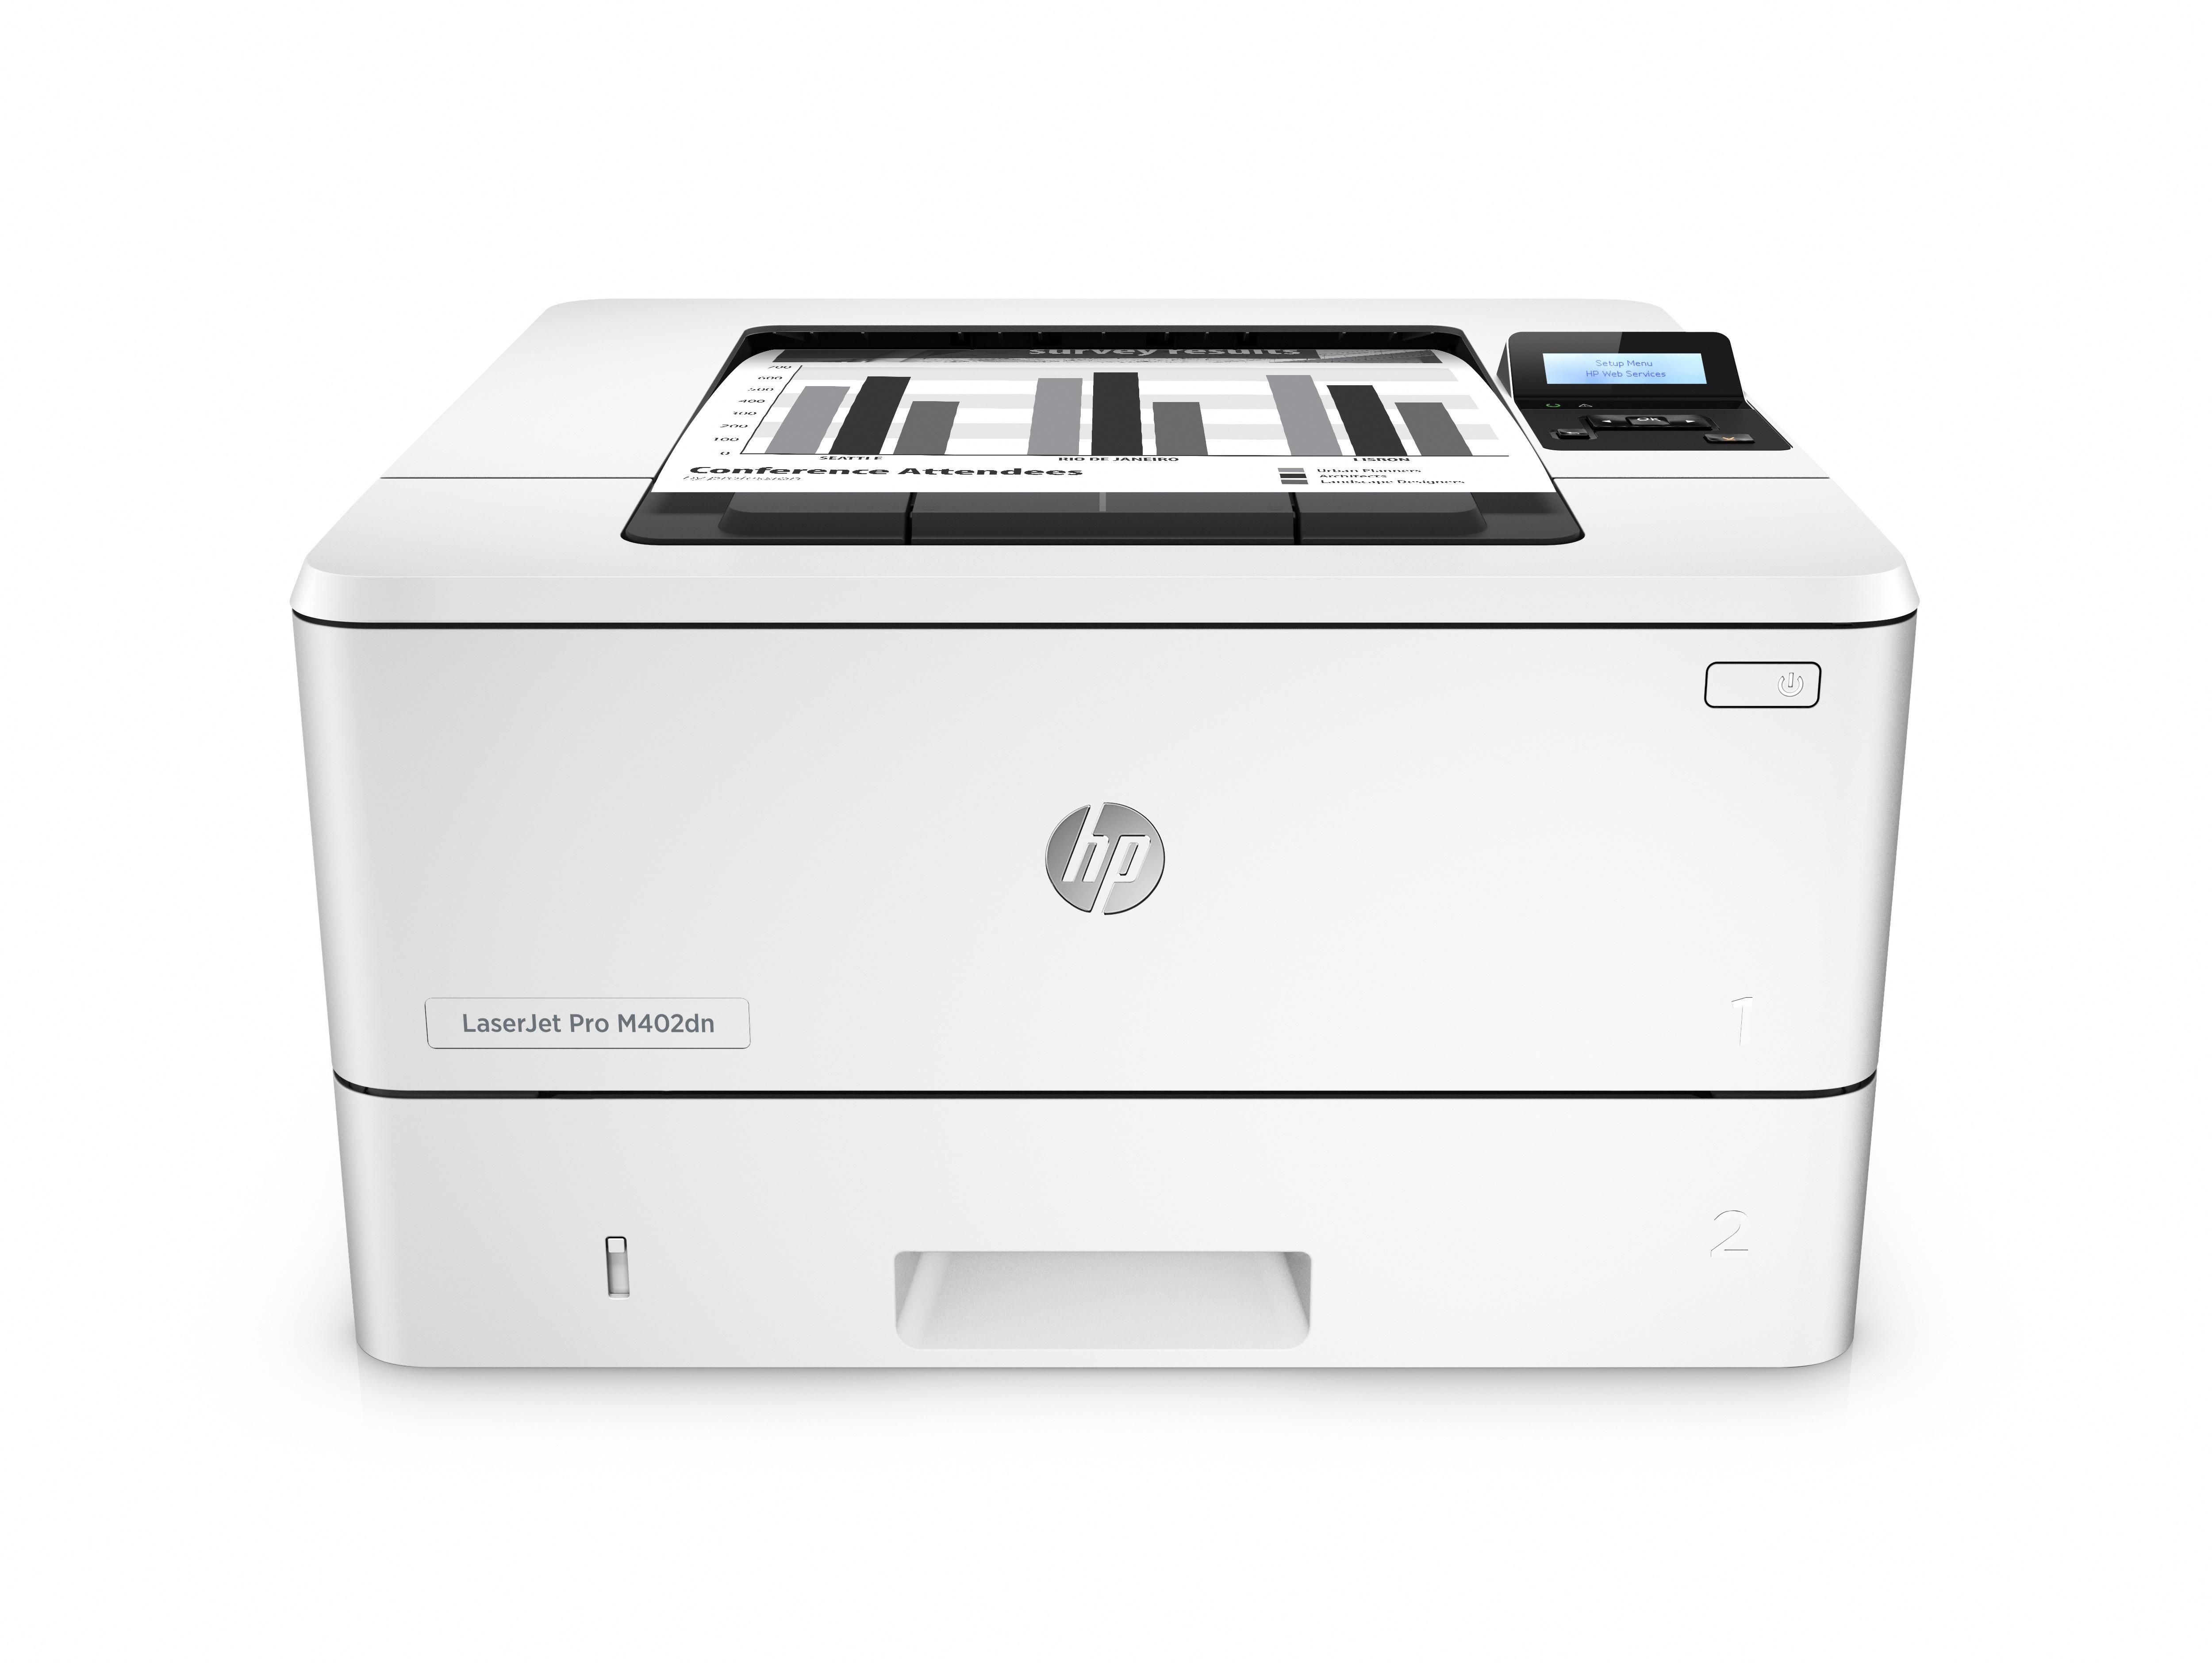 HP LaserJet Pro M402dn 1200 x 1200DPI A4 Grey